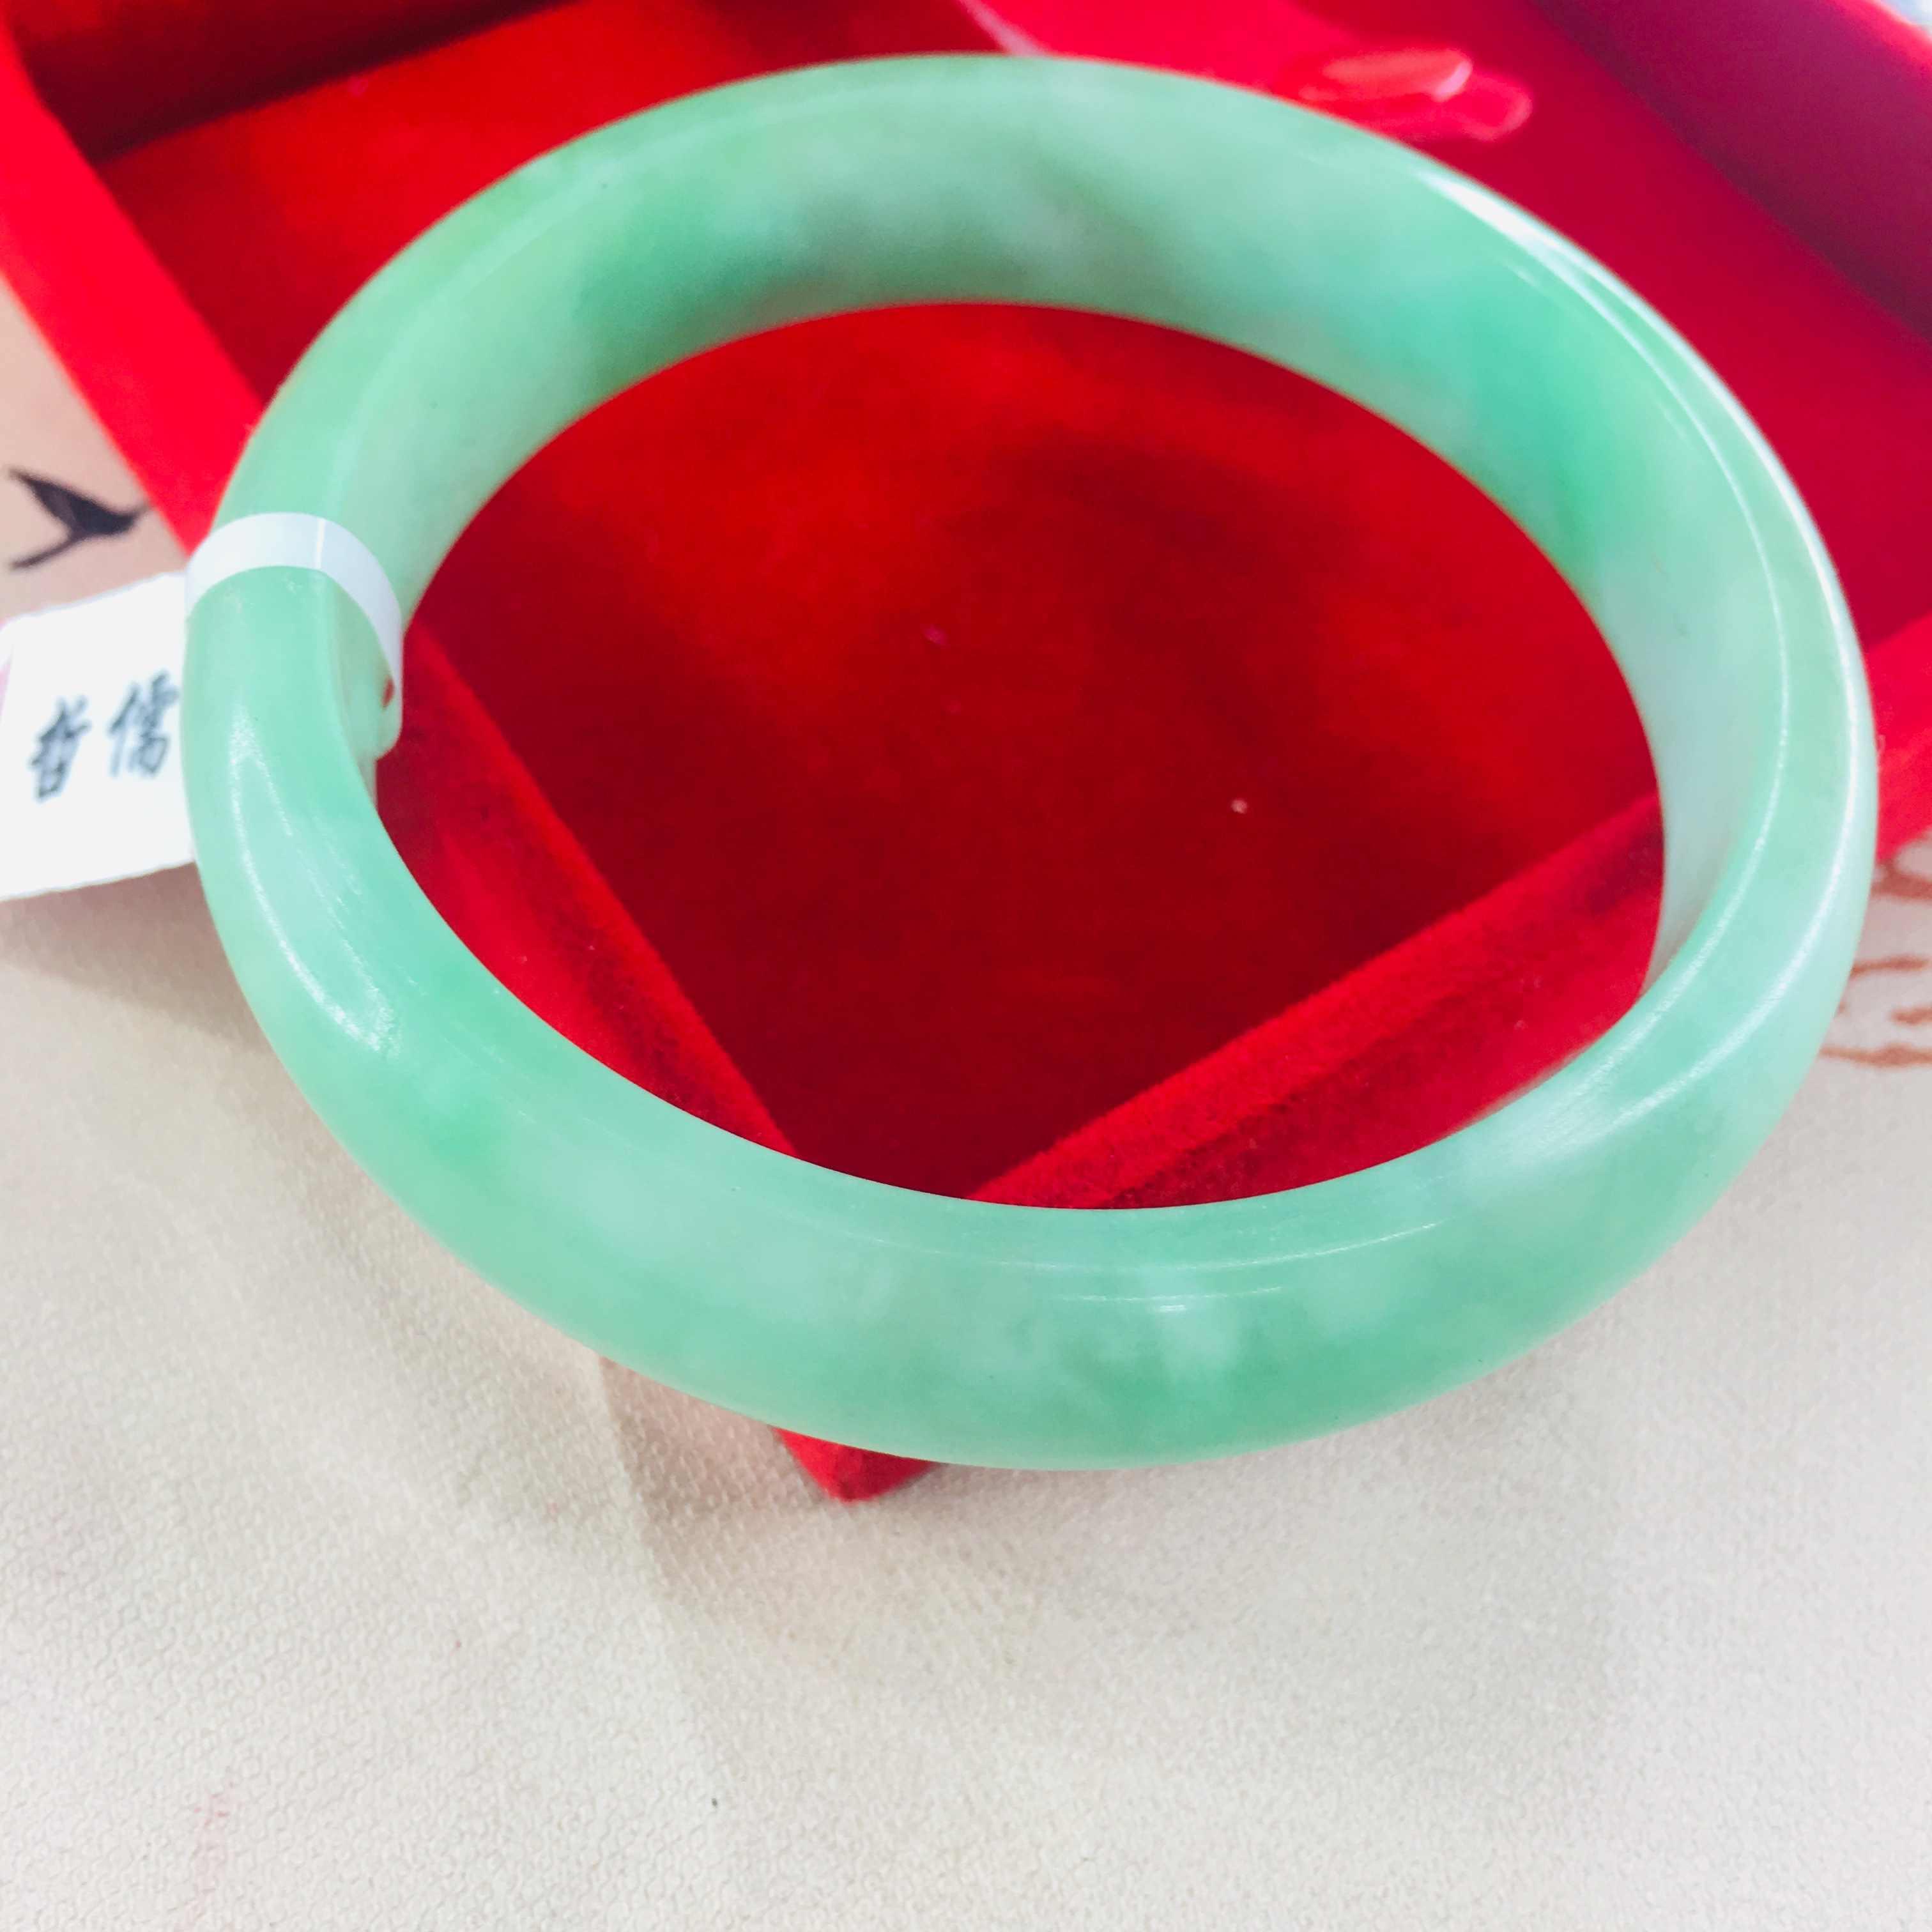 Zheru เครื่องประดับธรรมชาติ Jadeite สร้อยข้อมือธรรมชาติด้านล่างแสงสีเขียวสีทึบ 54-62 มม.หญิง Royal ของขวัญส่ง Certifica